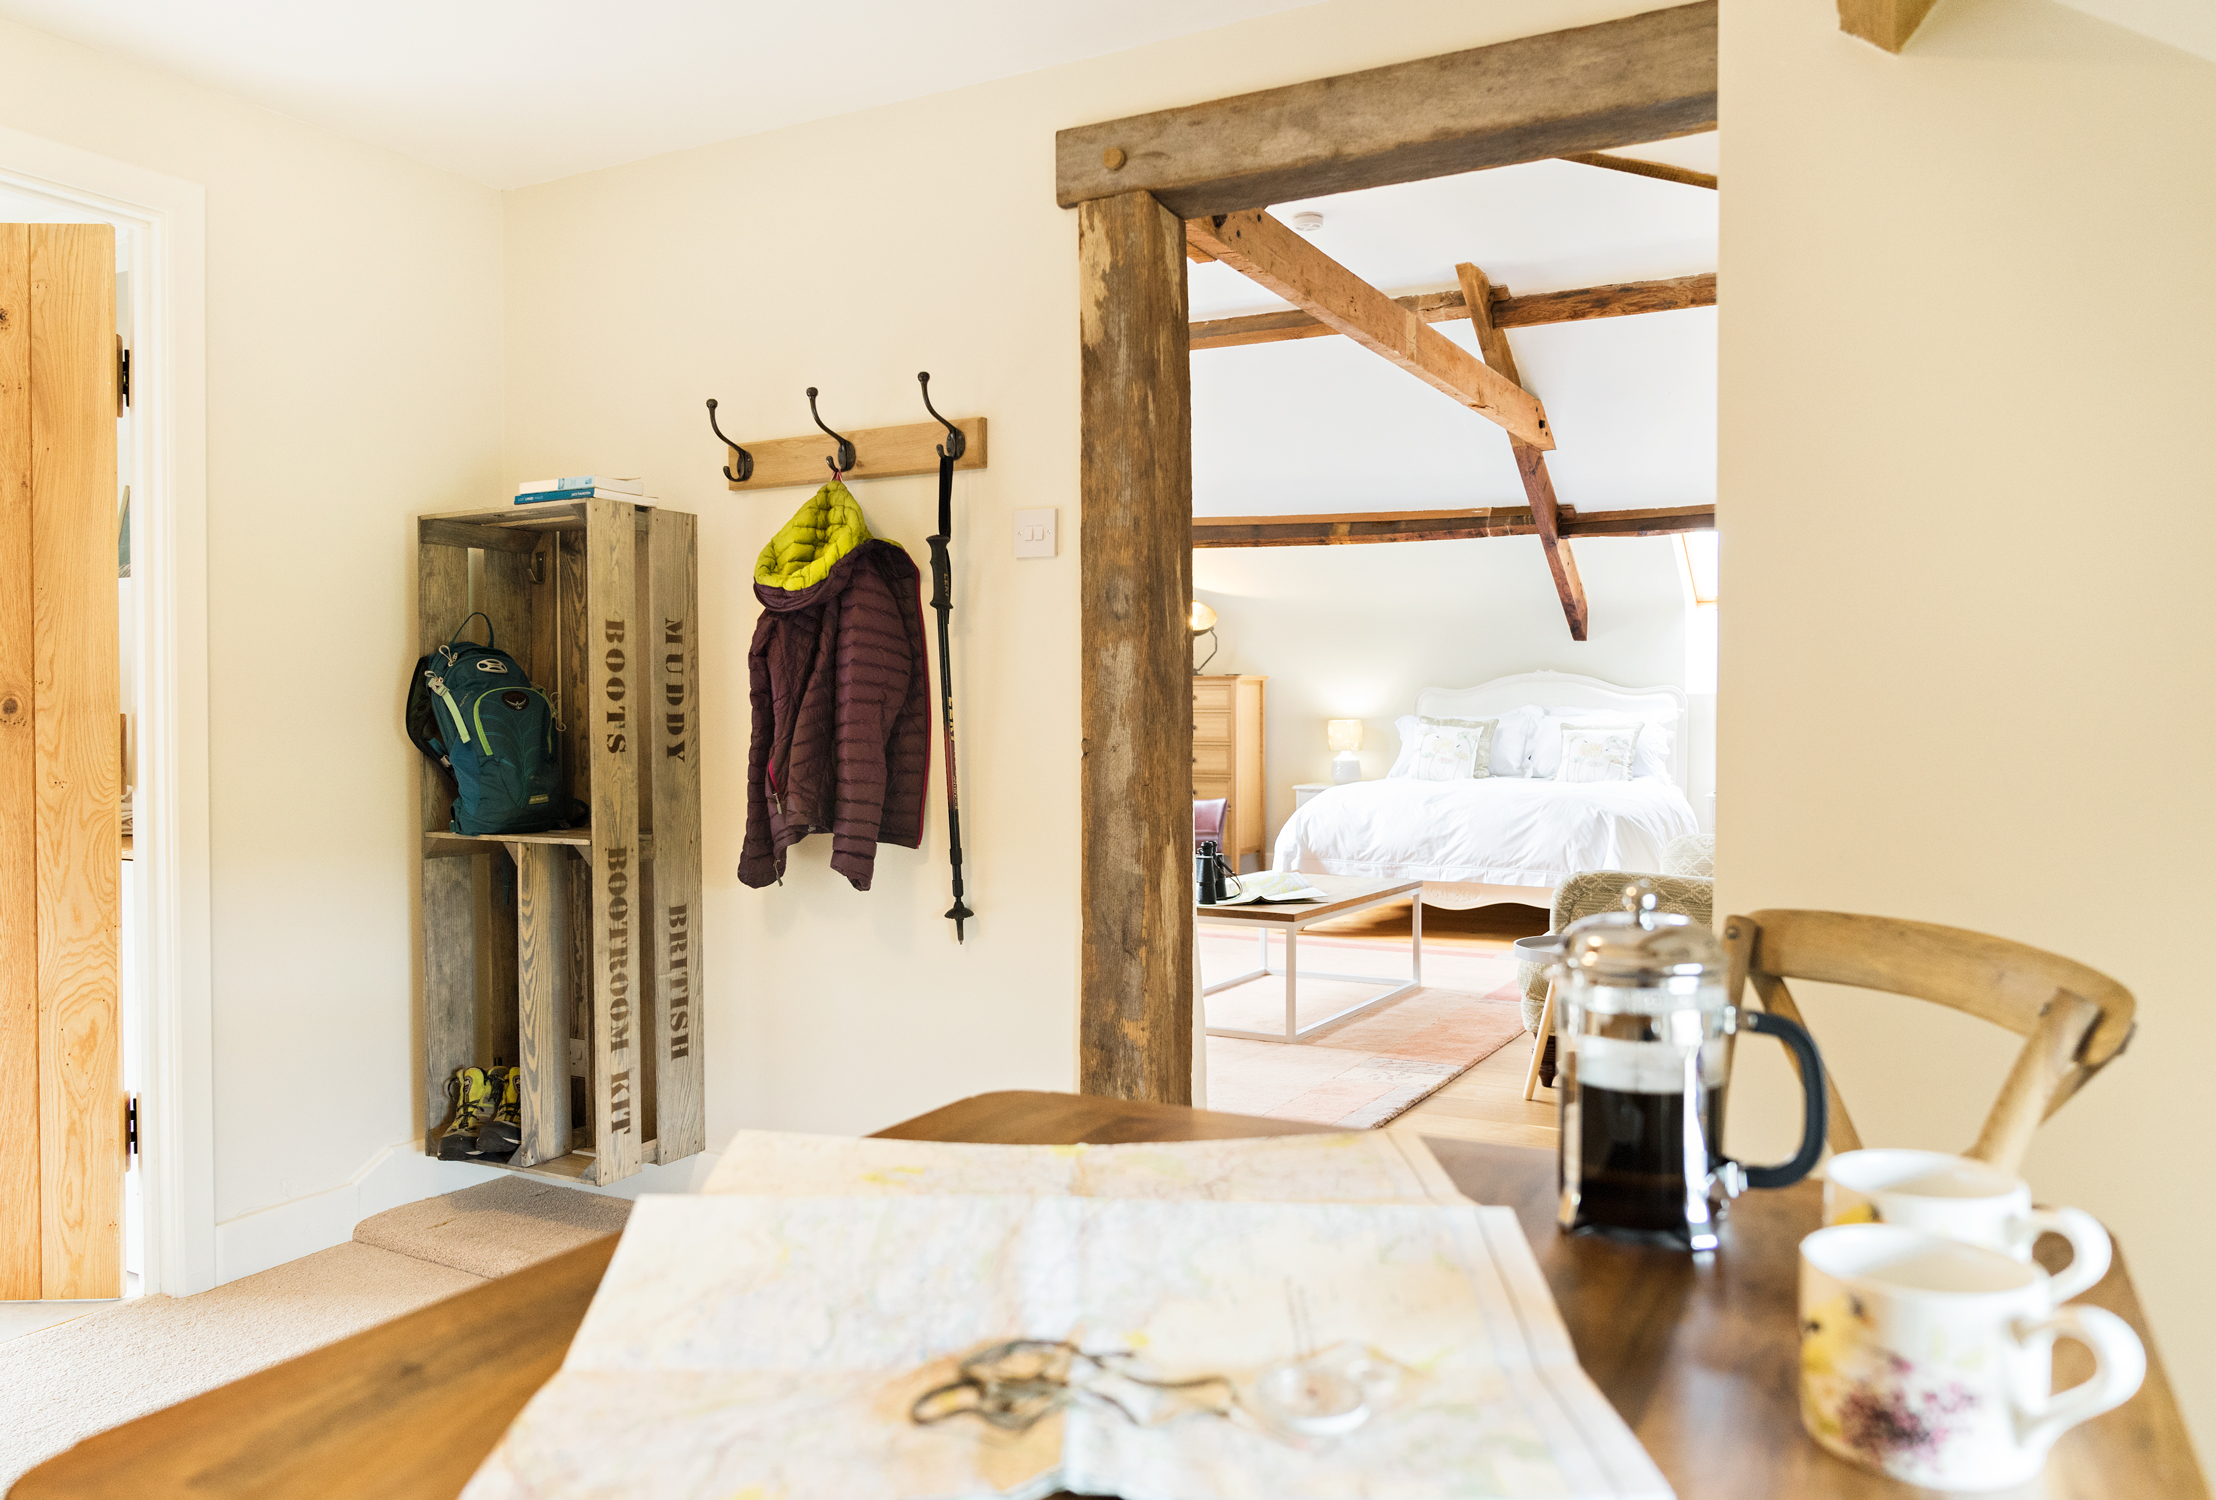 Loft Suite Kit Area Looking towards Bed Room